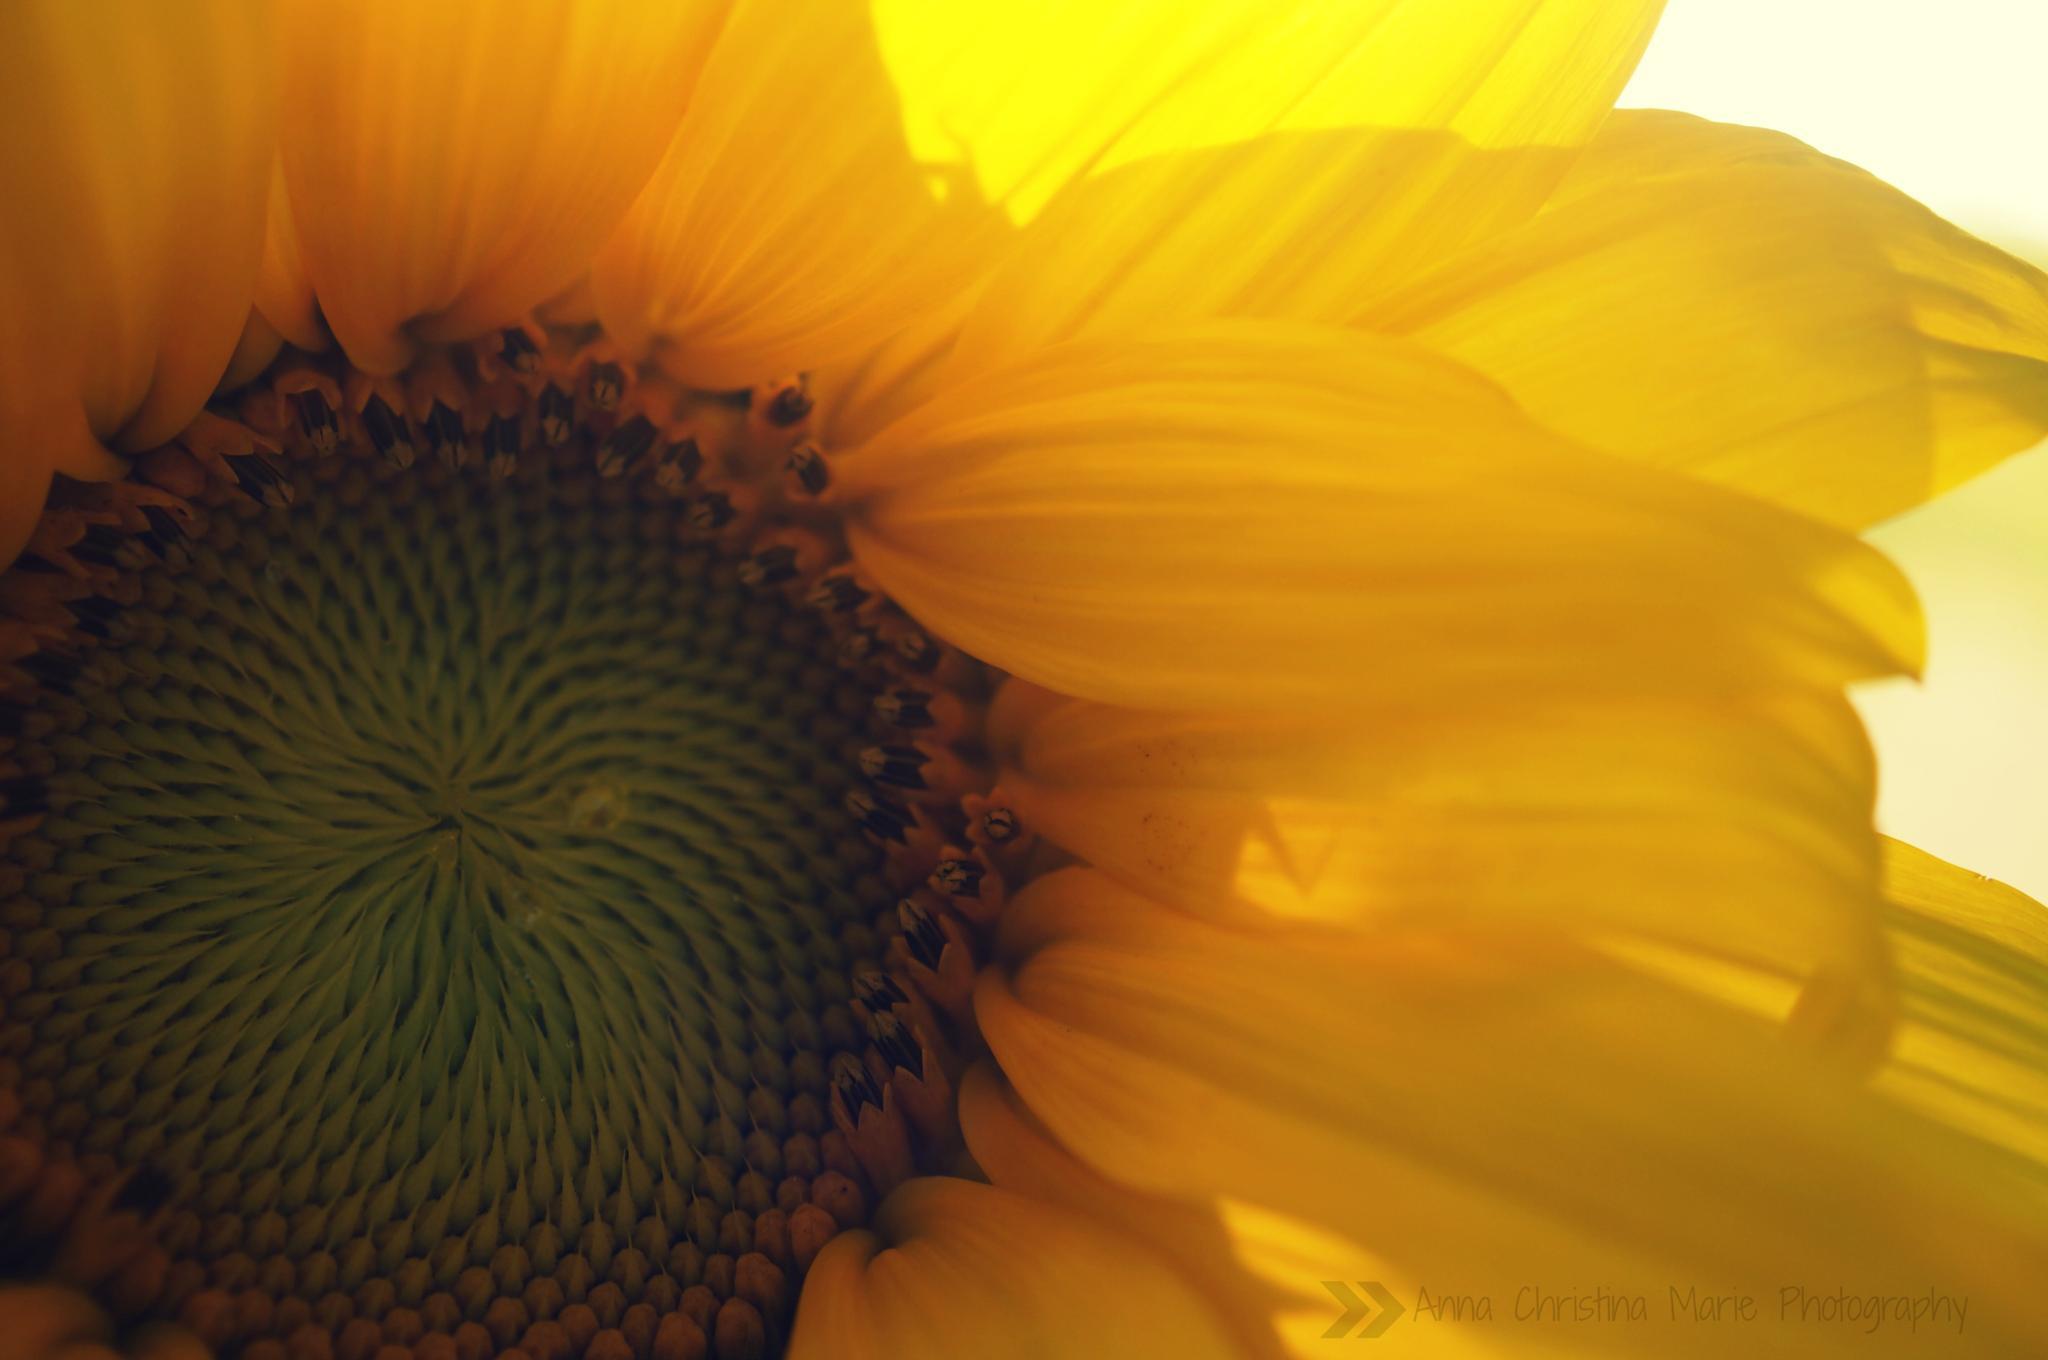 Sunflower Splendor  by Anna christina Marie